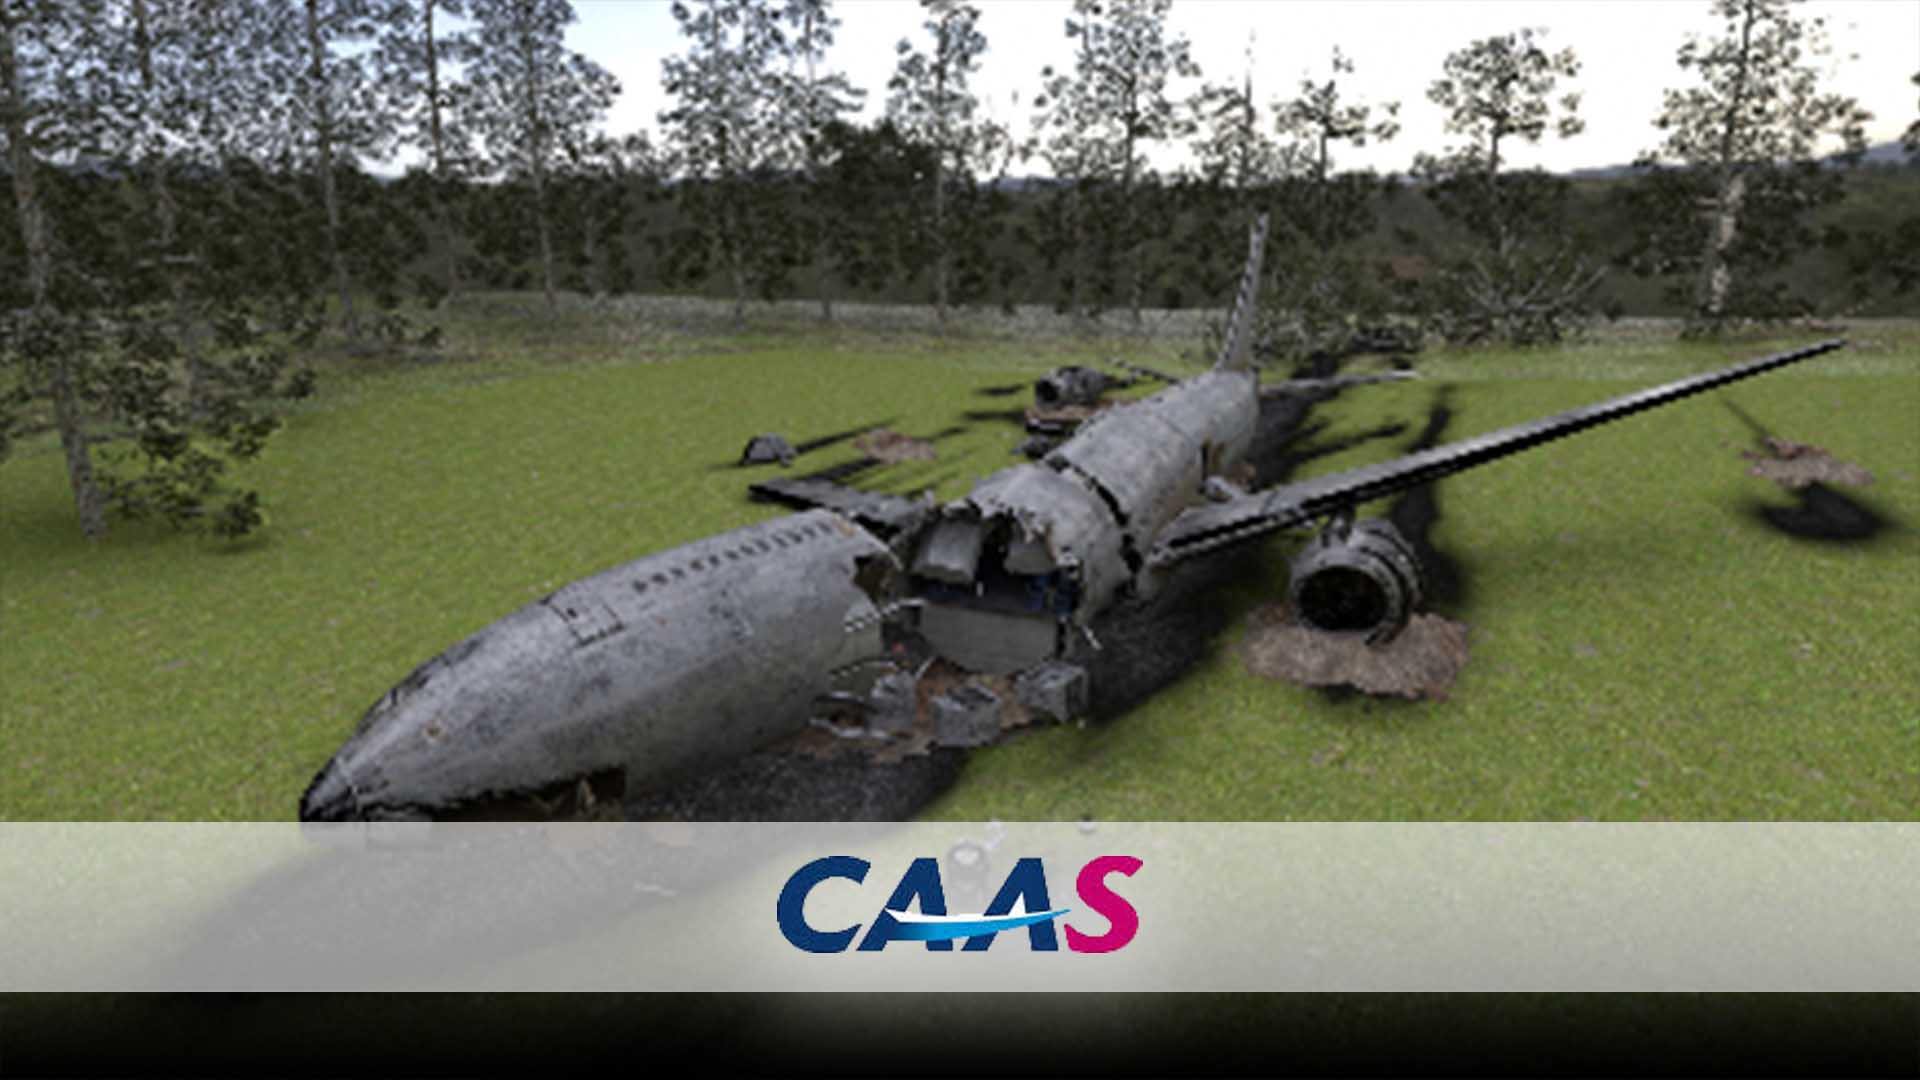 CAAS Aircraft Crash VR Investigation